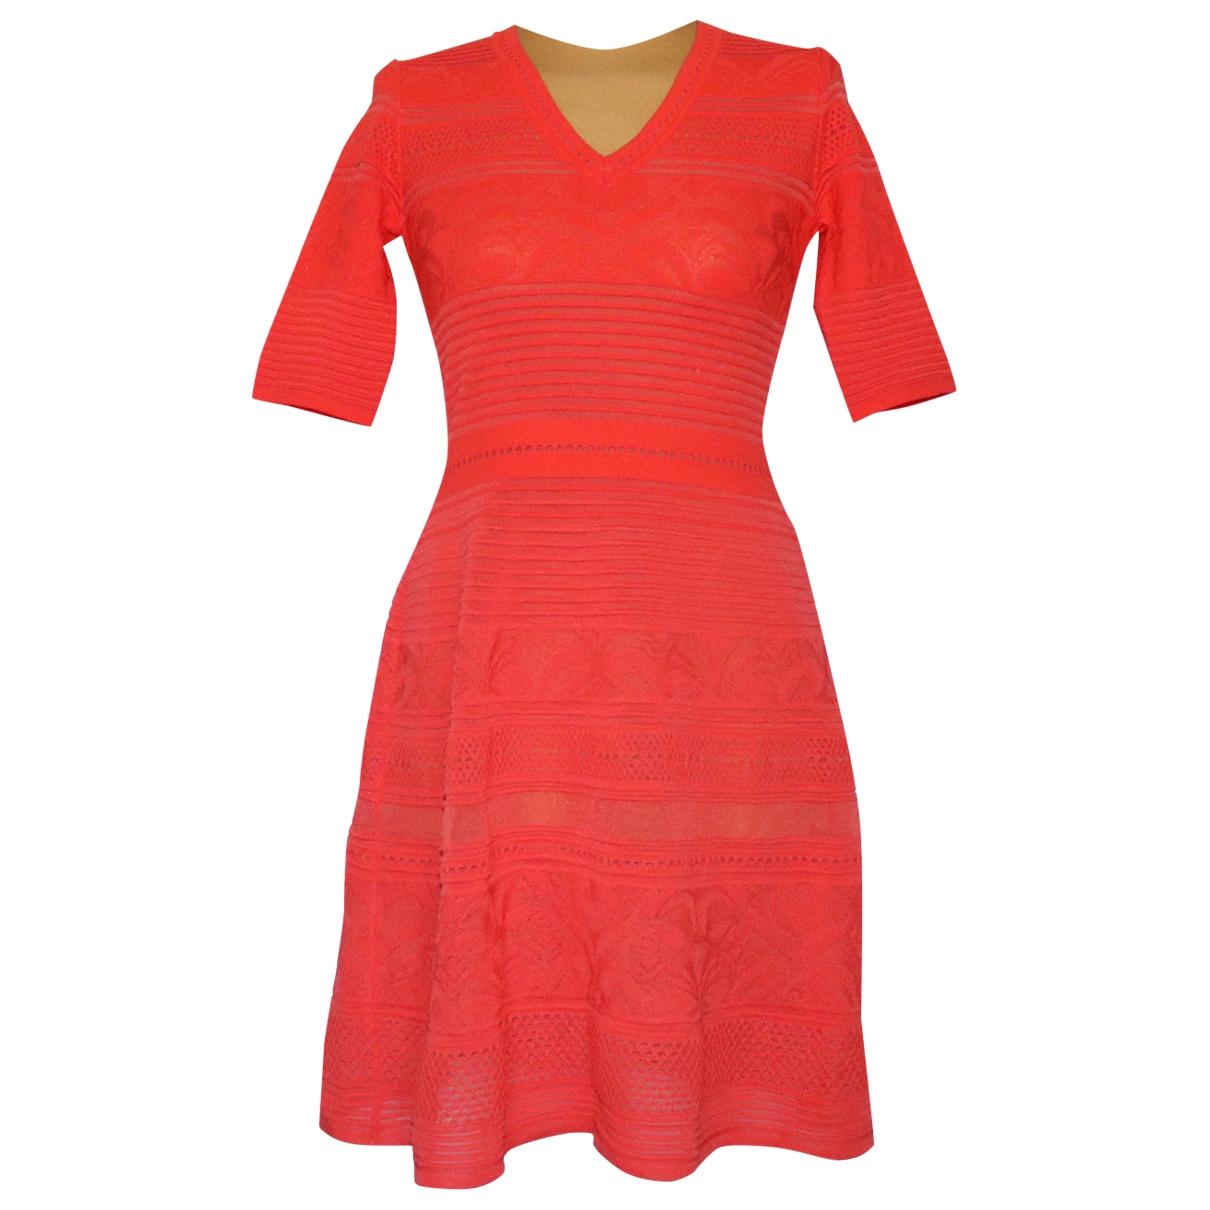 M Missoni \N Orange Cotton - elasthane dress for Women 40 IT